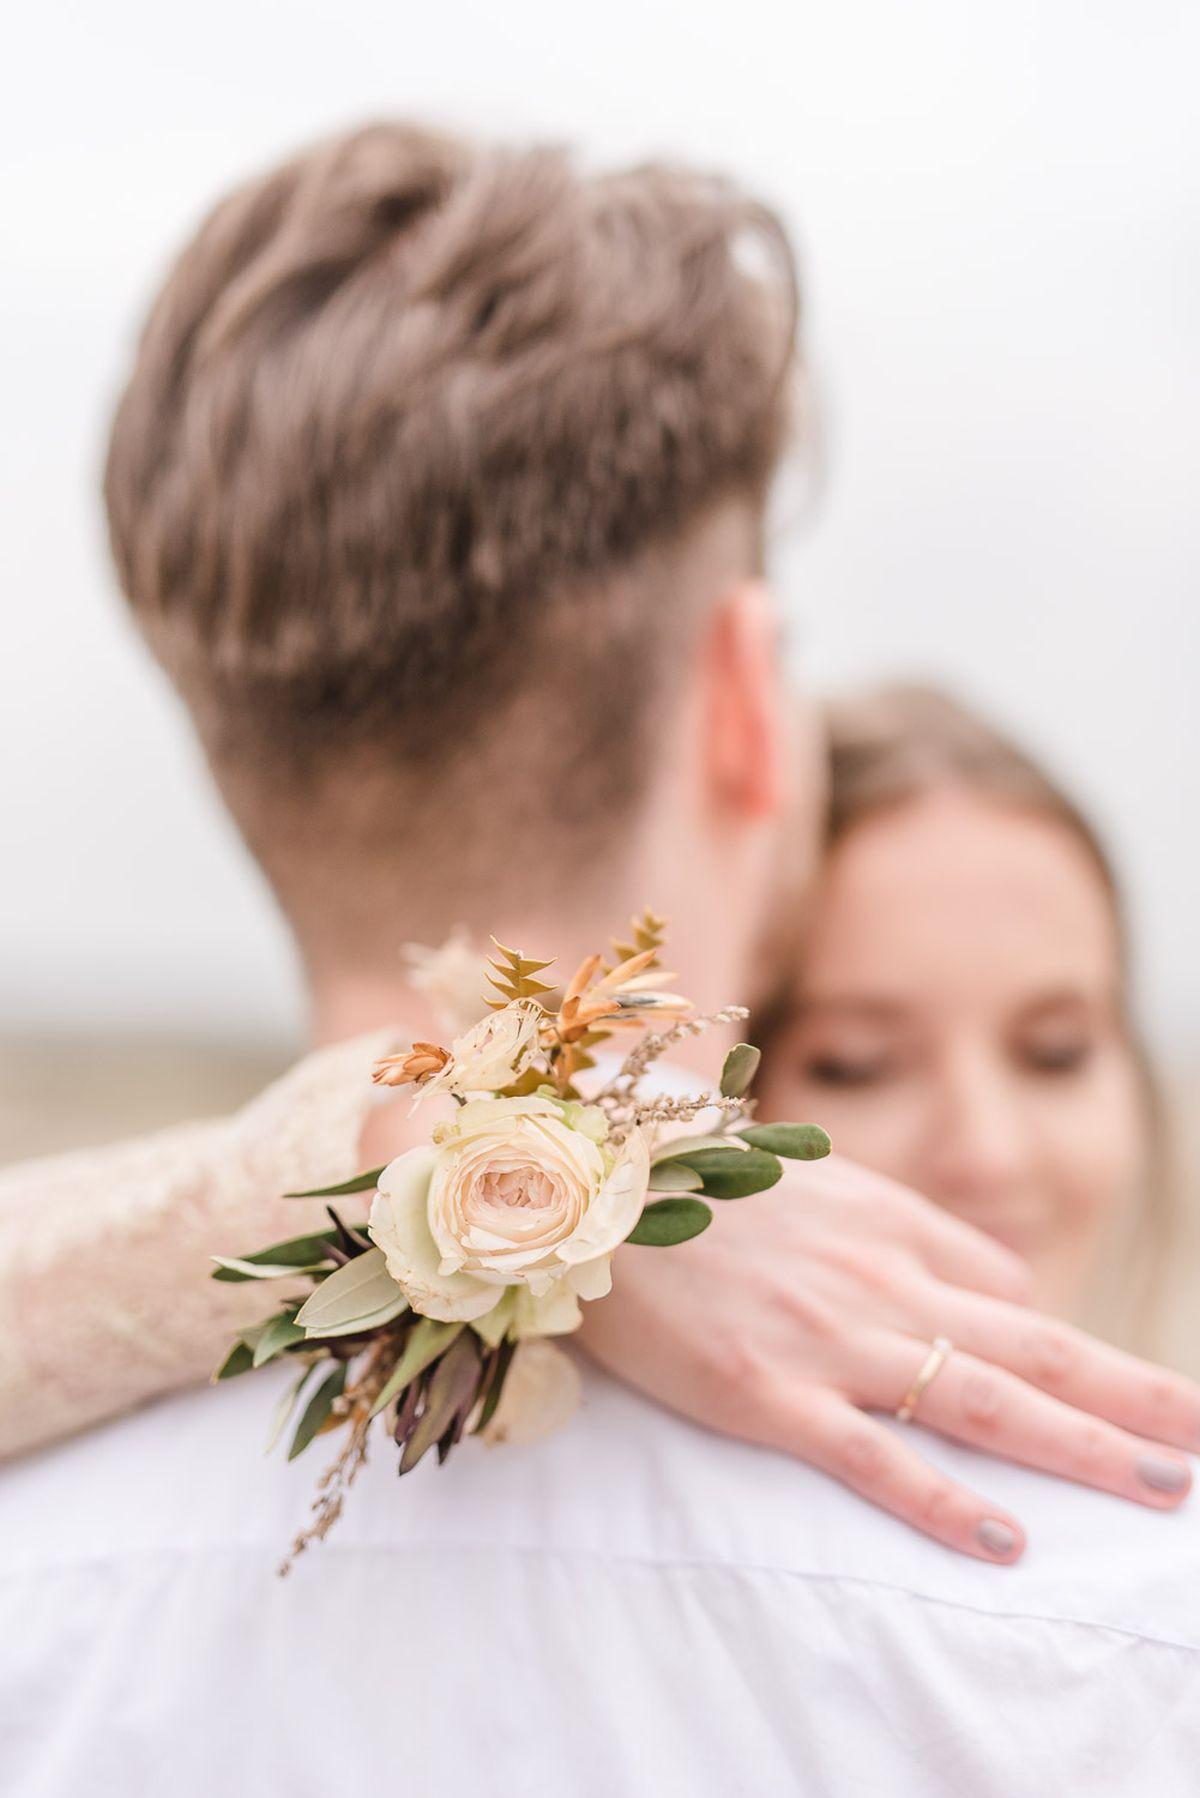 aschaaa-photography-wedding-shoot-wüste (6)